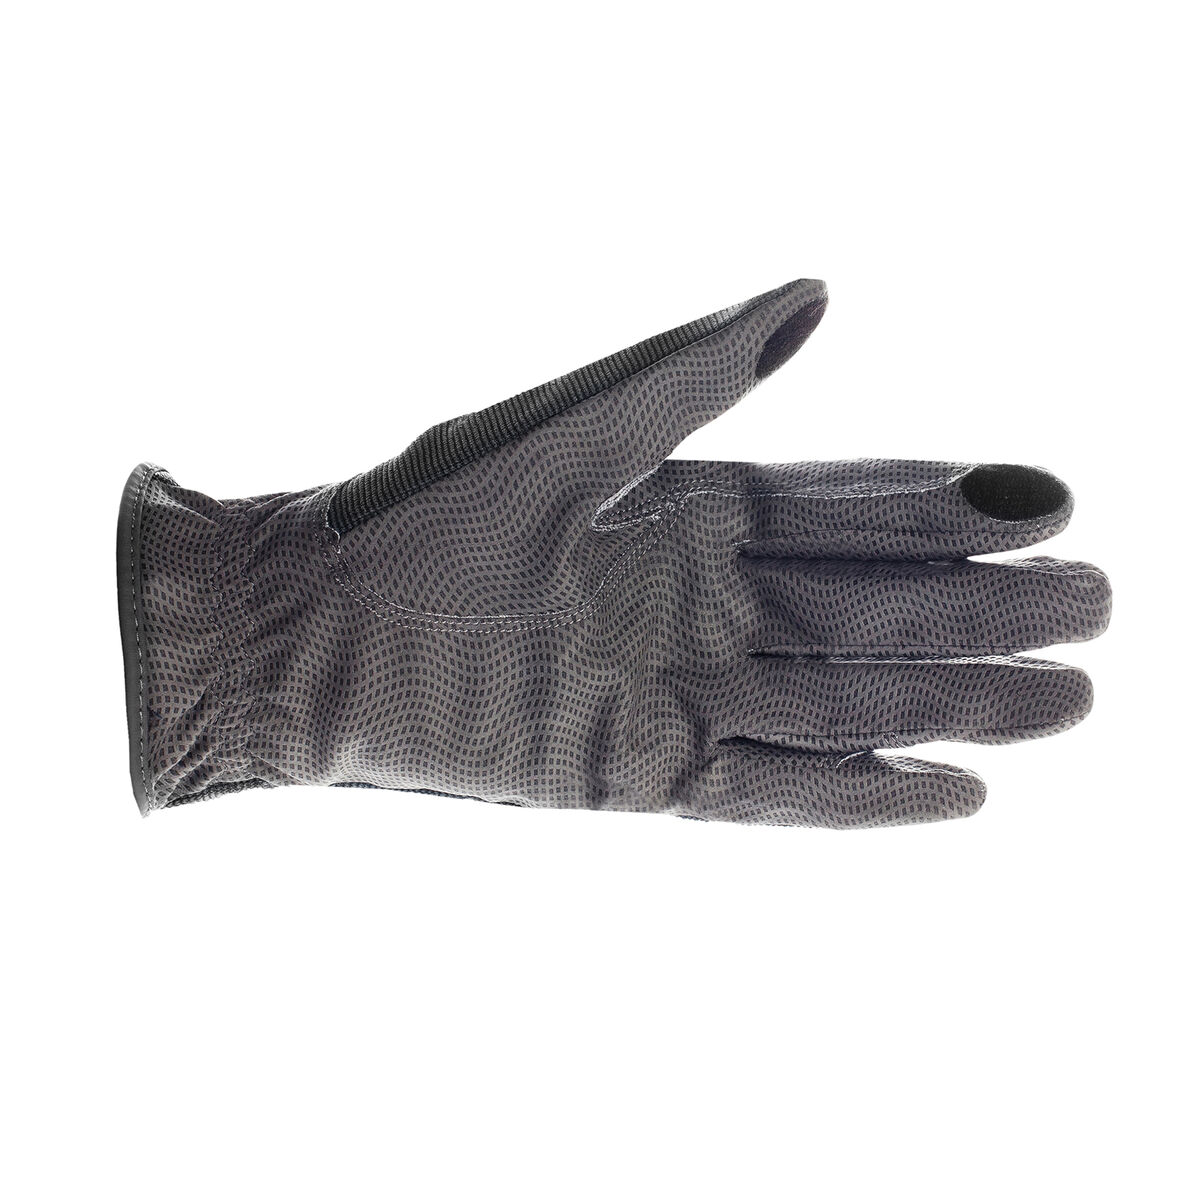 Black riding gloves -  Horze Shona Touch Screen Riding Gloves